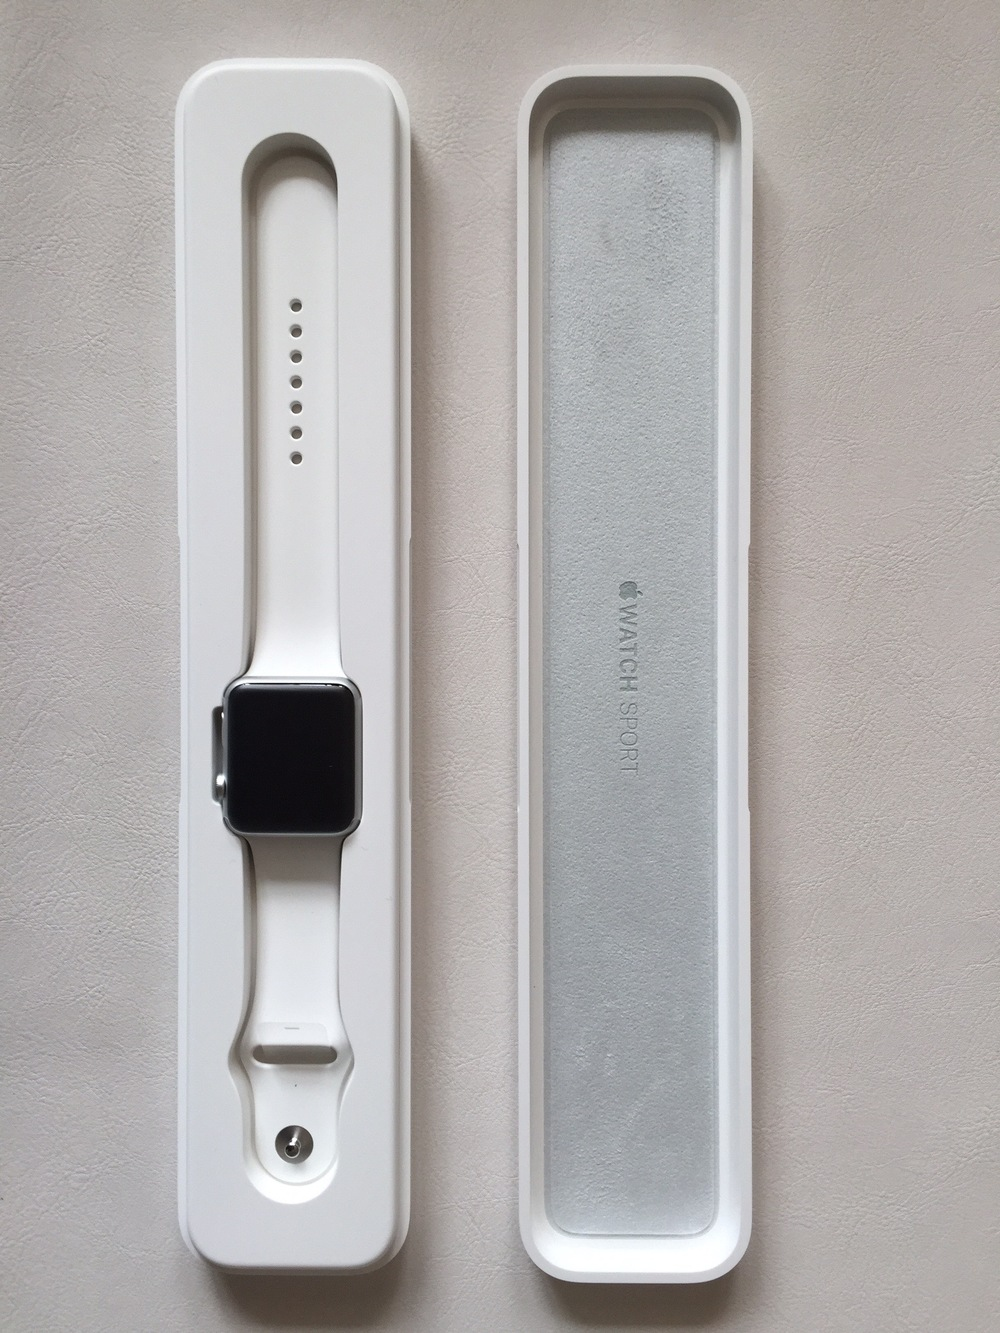 White-Apple-Sport-Watch-Unboxing-12.jpg